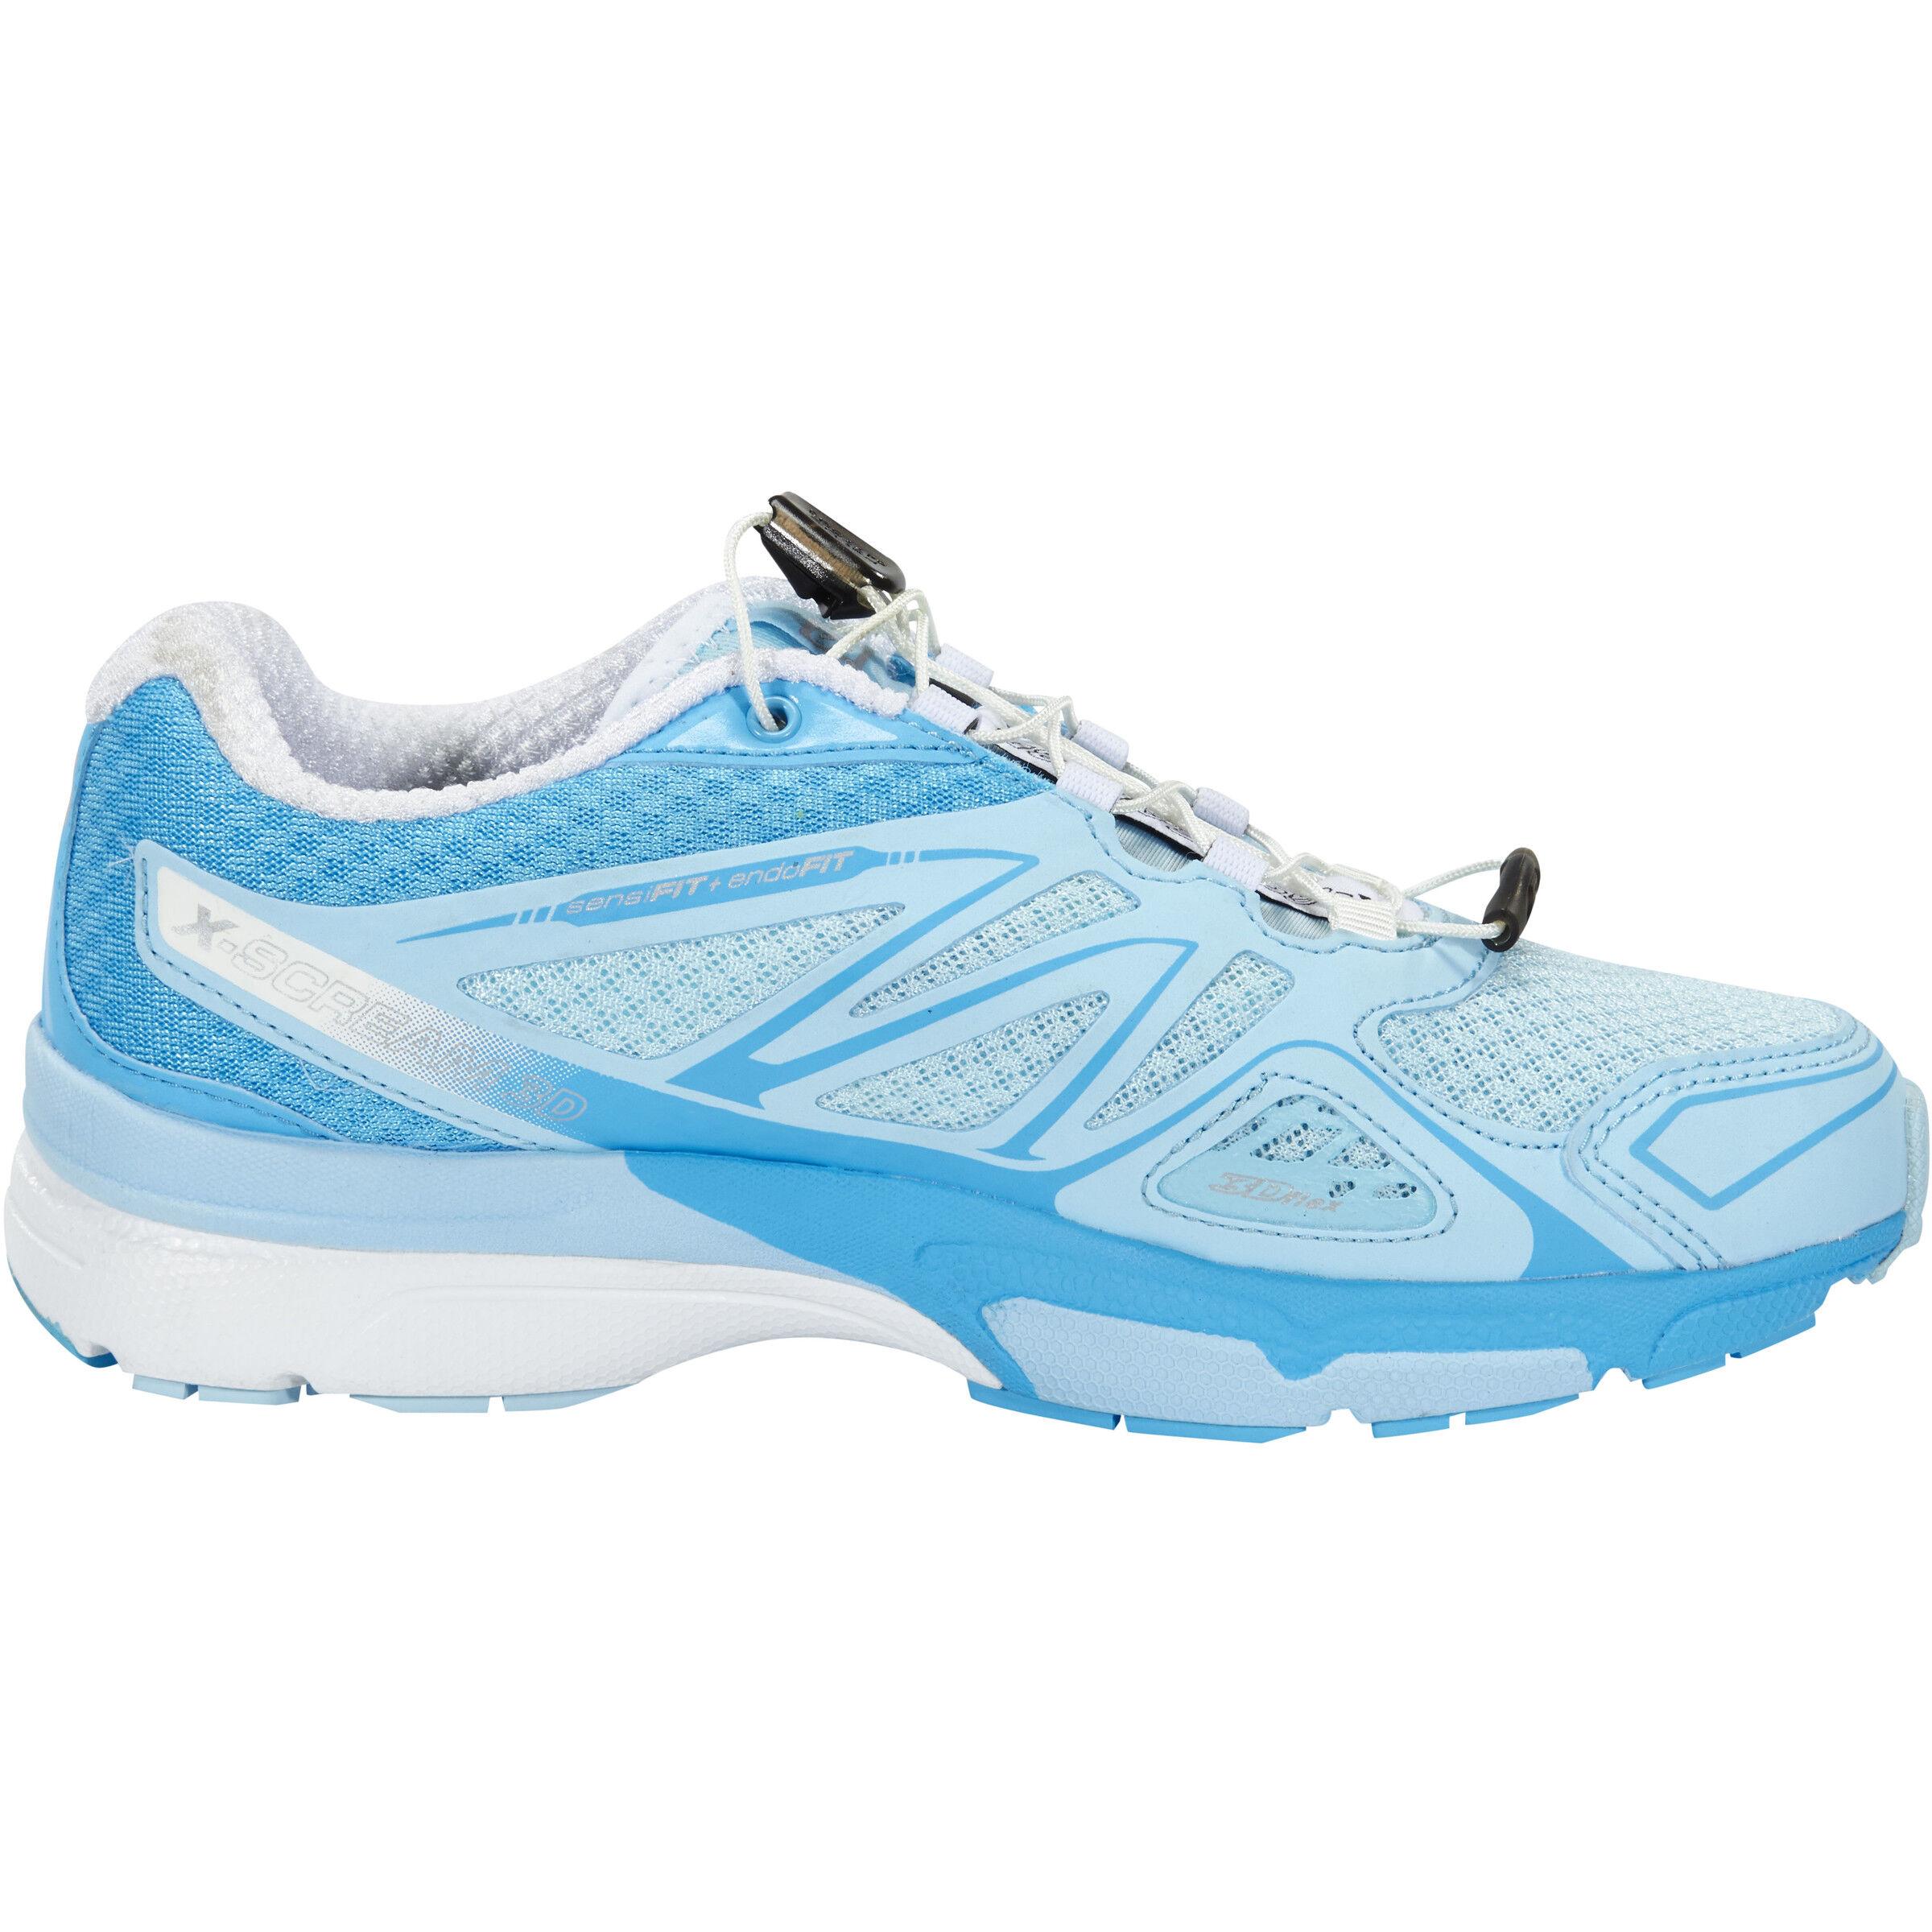 Salomon X Scream 3D Trailrunning Shoes Damen airwhiteblue line qfaFF